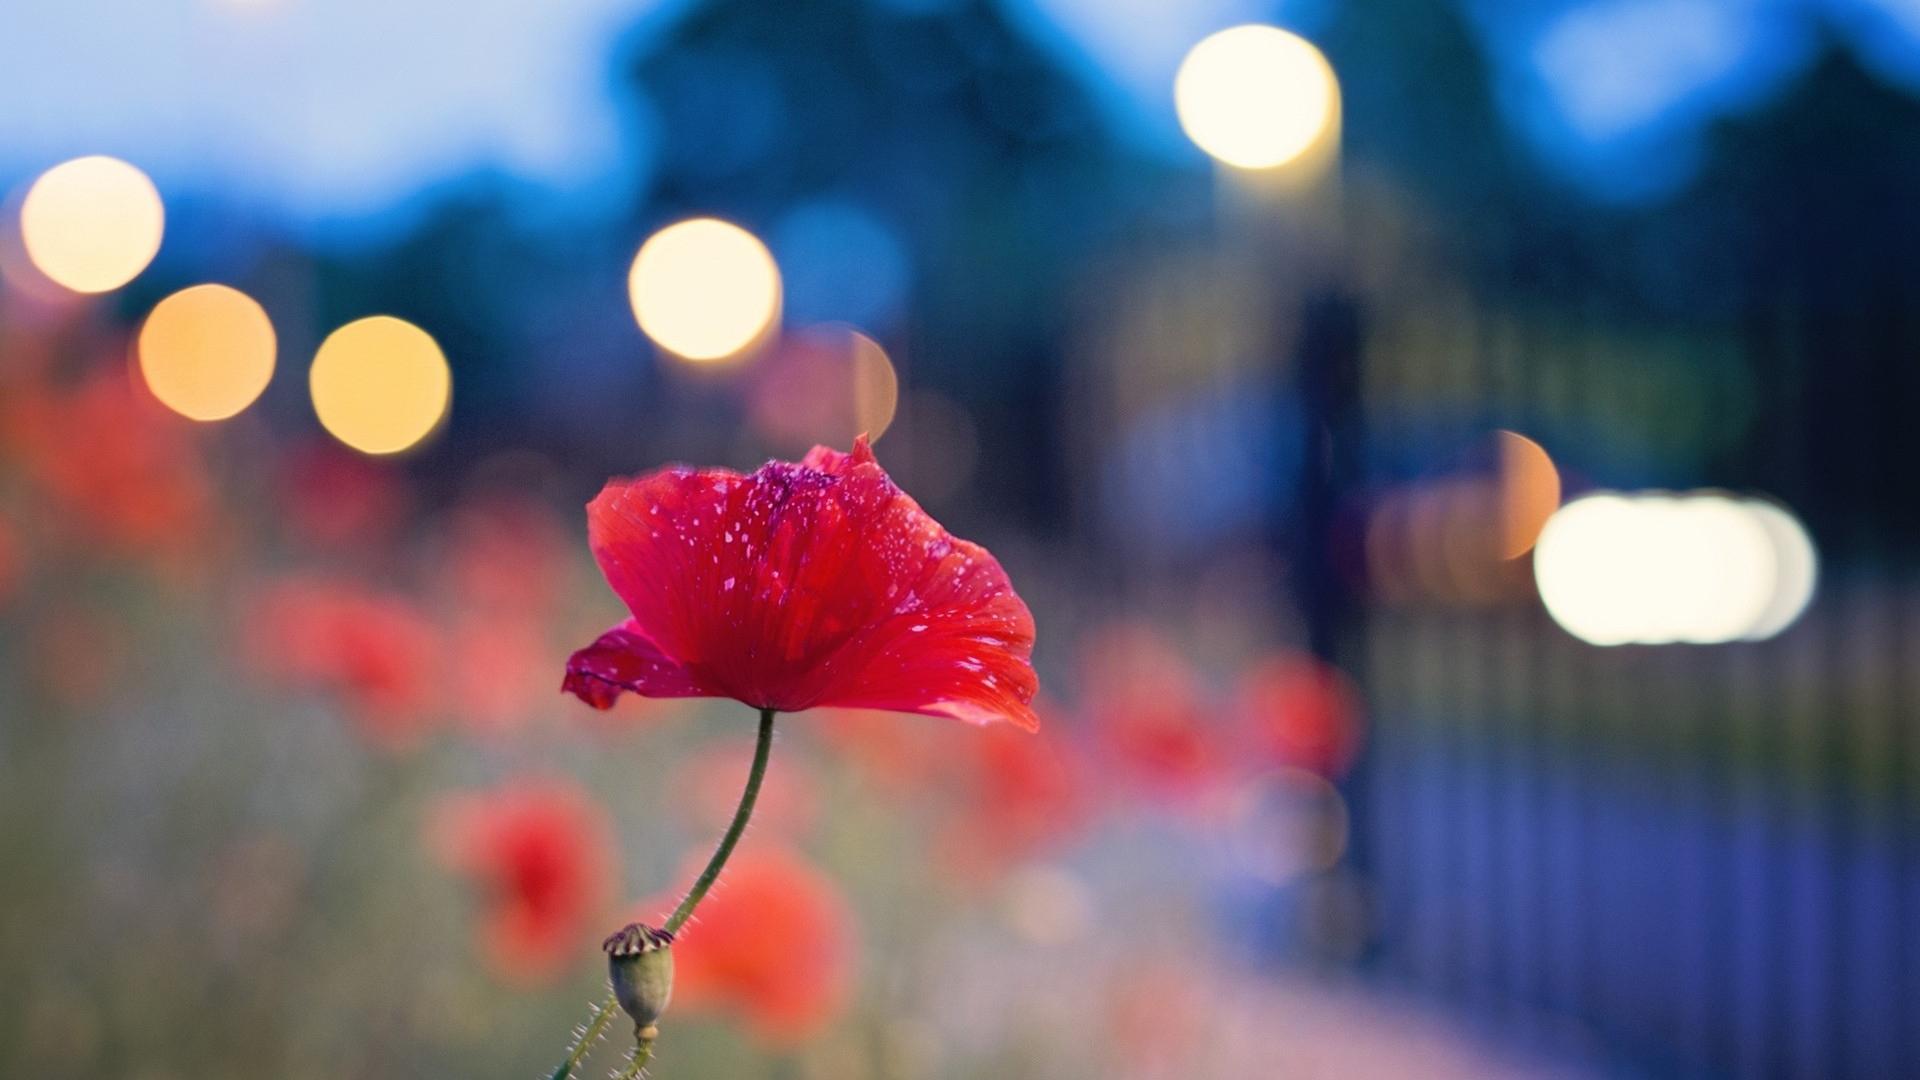 download wallpaper 1920x1080 flower poppy seeds plant macro